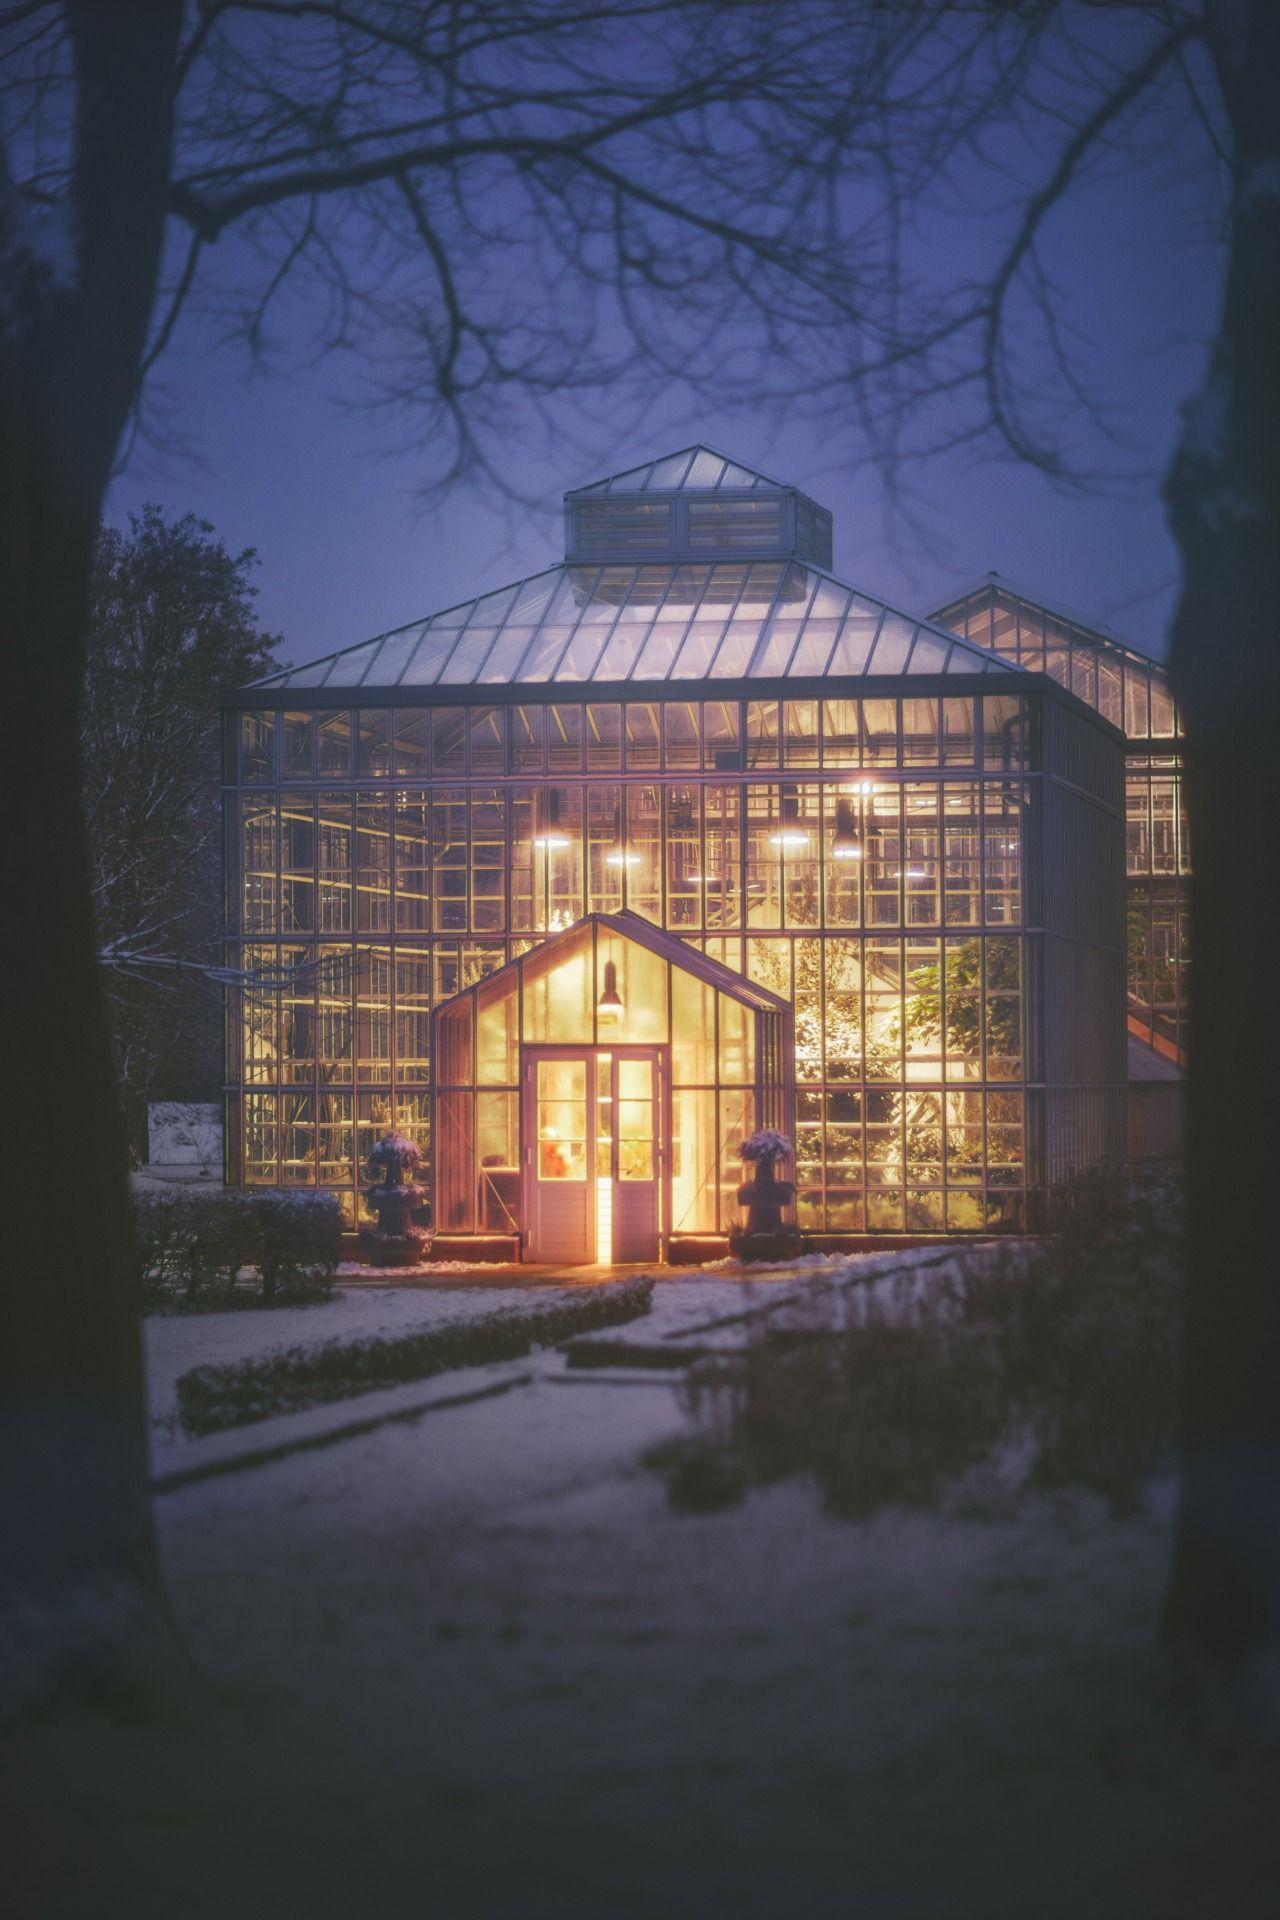 Greenhouse Berlin Botanischer Garten Greenhouse Landscape Meolog On Pankow Photographers Snow Source Tumblr Greenhouse Modern Garden Landscape